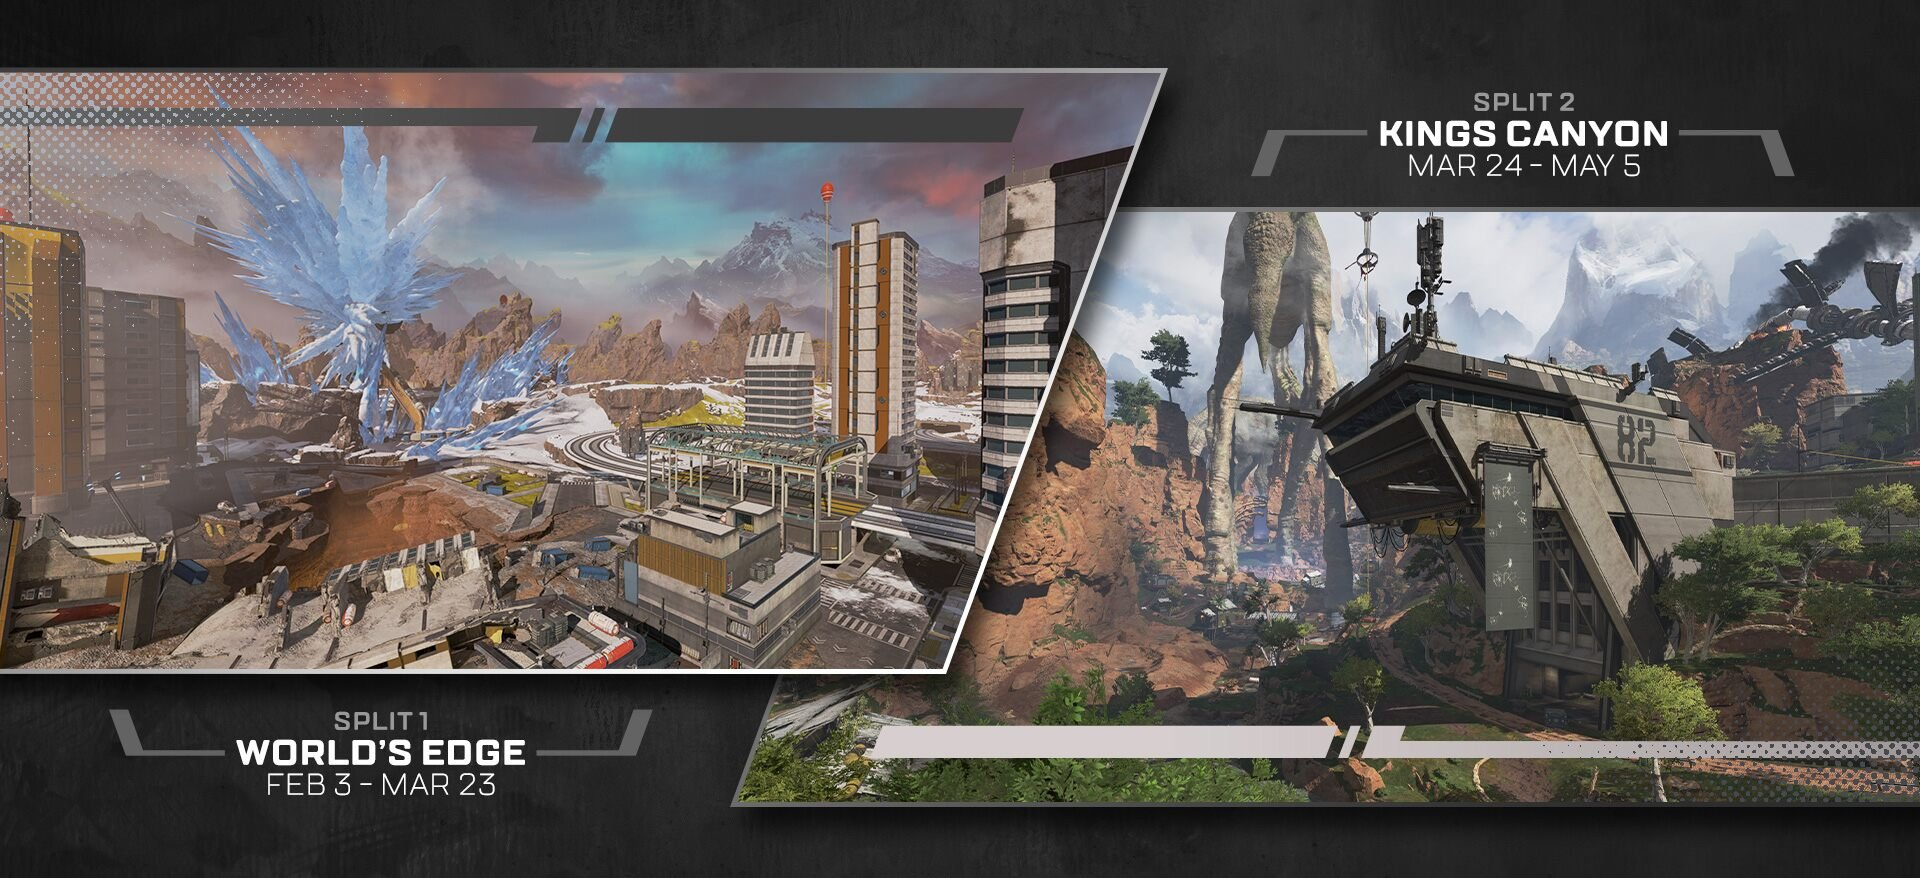 World's Edge / Apex Legends